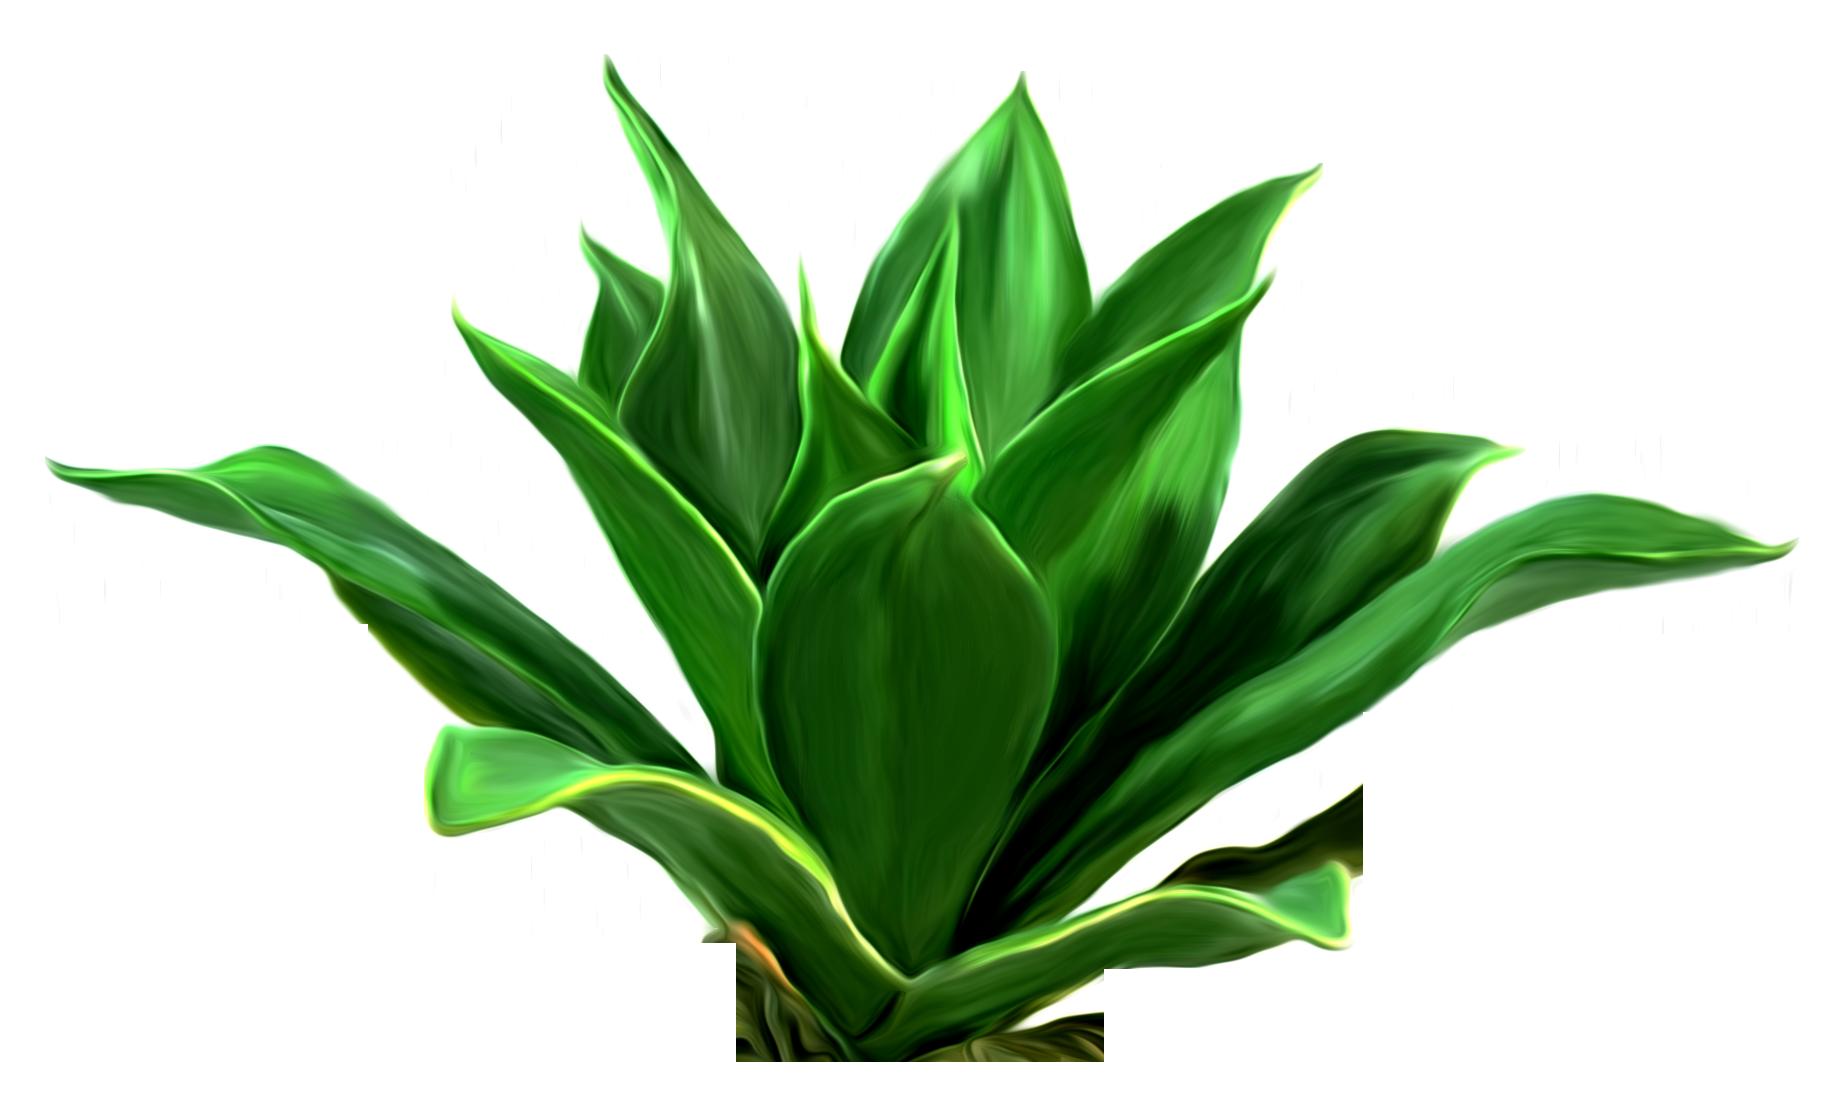 Algae clipart seagrass. Leaf download clip art